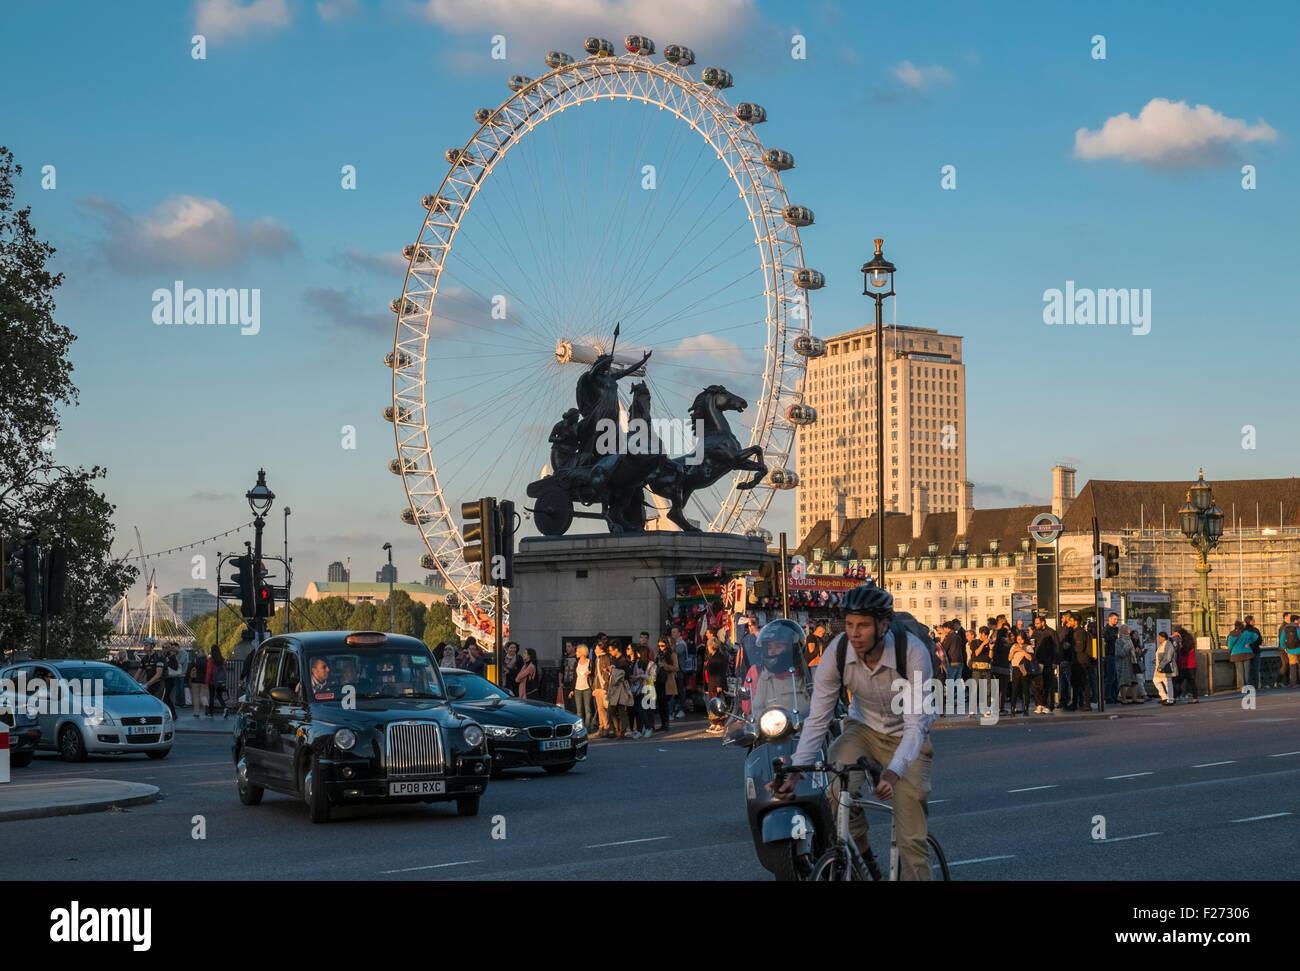 London Eye viewed from popular tourist spot near Westminster Bridge, London, England UK Stock Photo